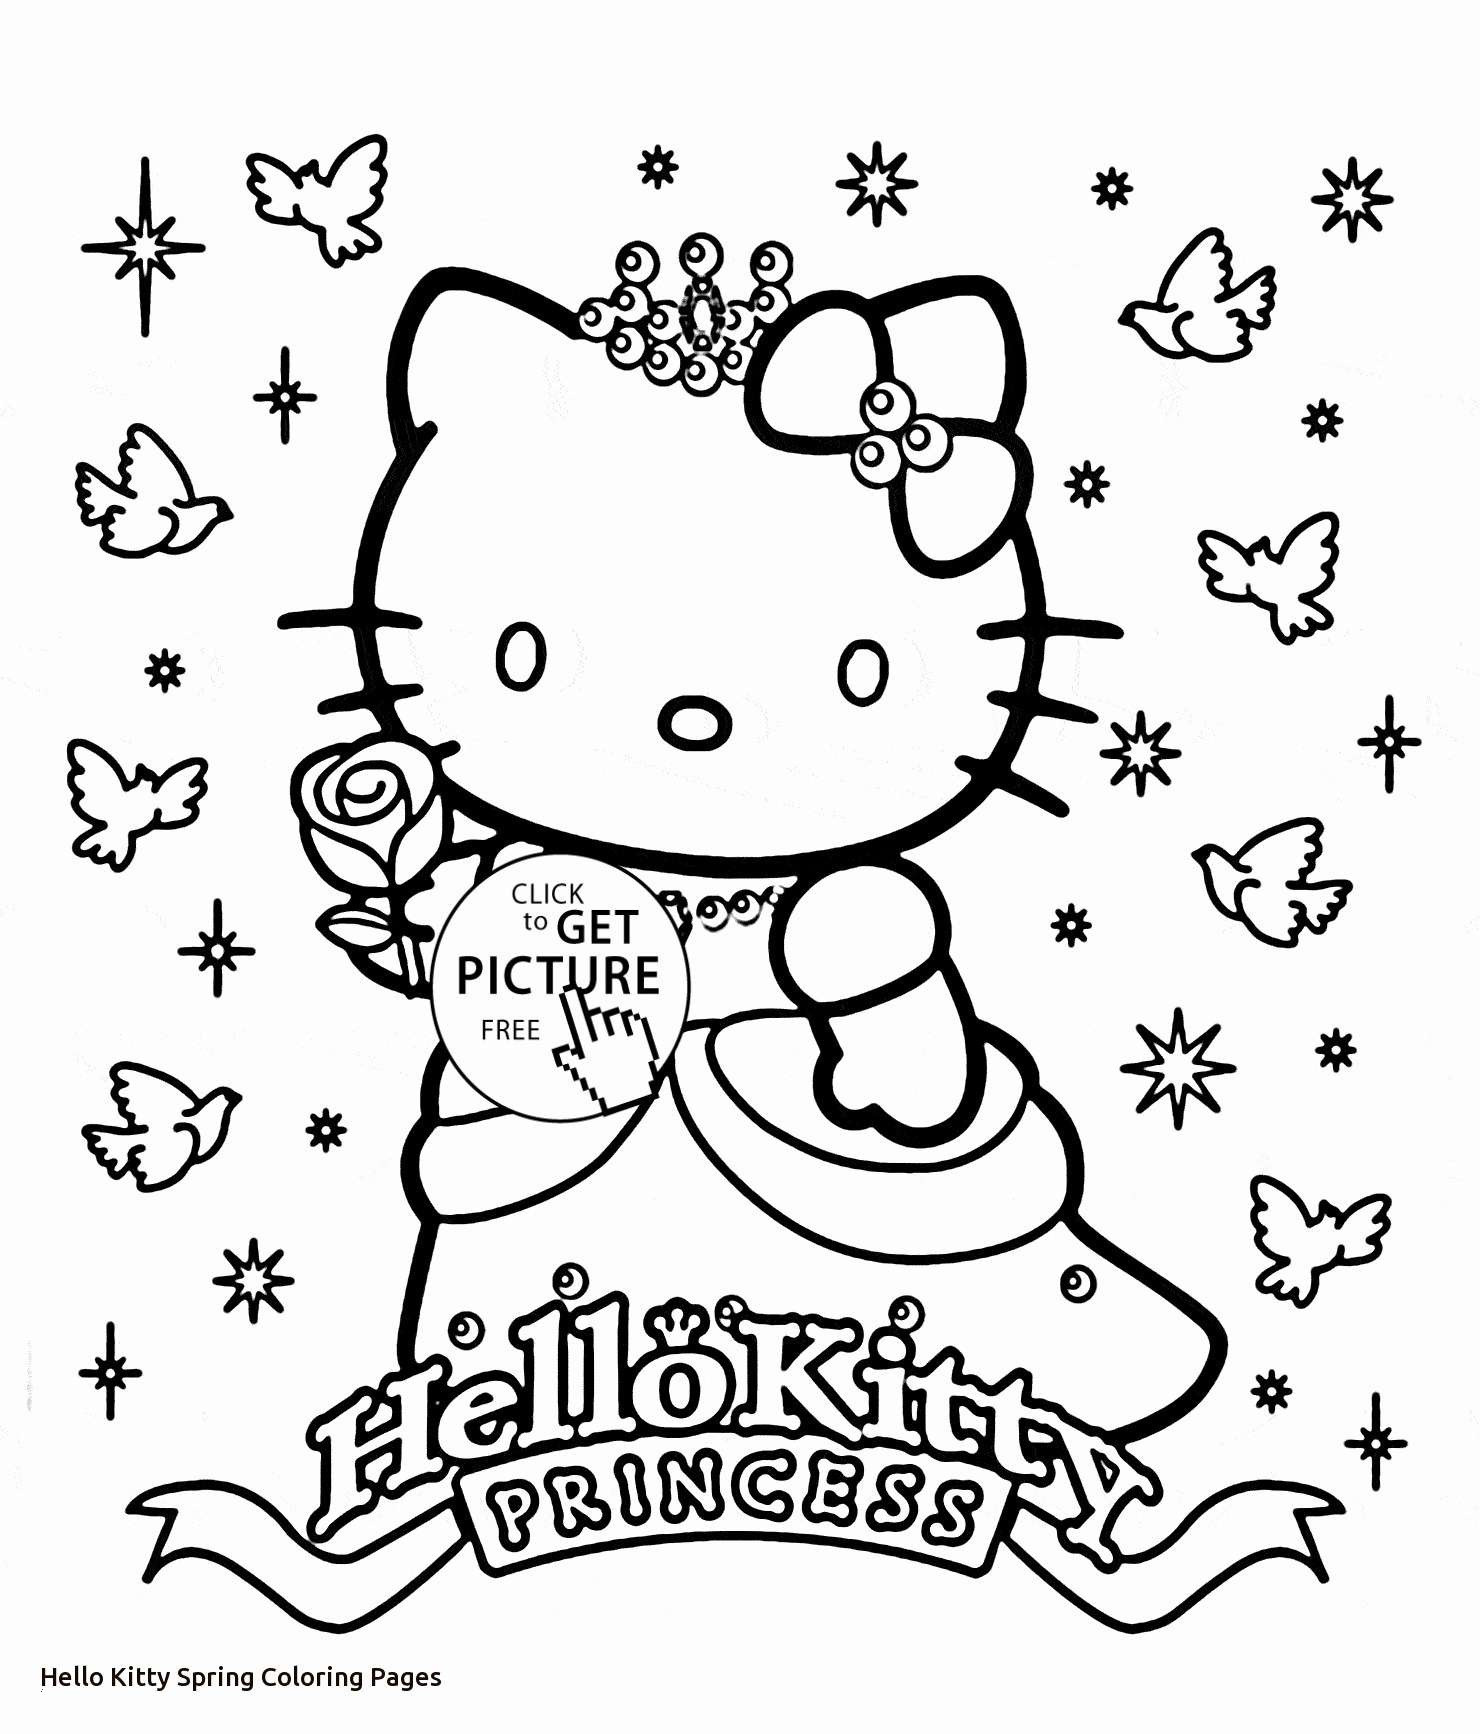 Ninjago Morro Ausmalbilder Genial 32 Ausmalbilder Hello Kitty forstergallery Sammlung